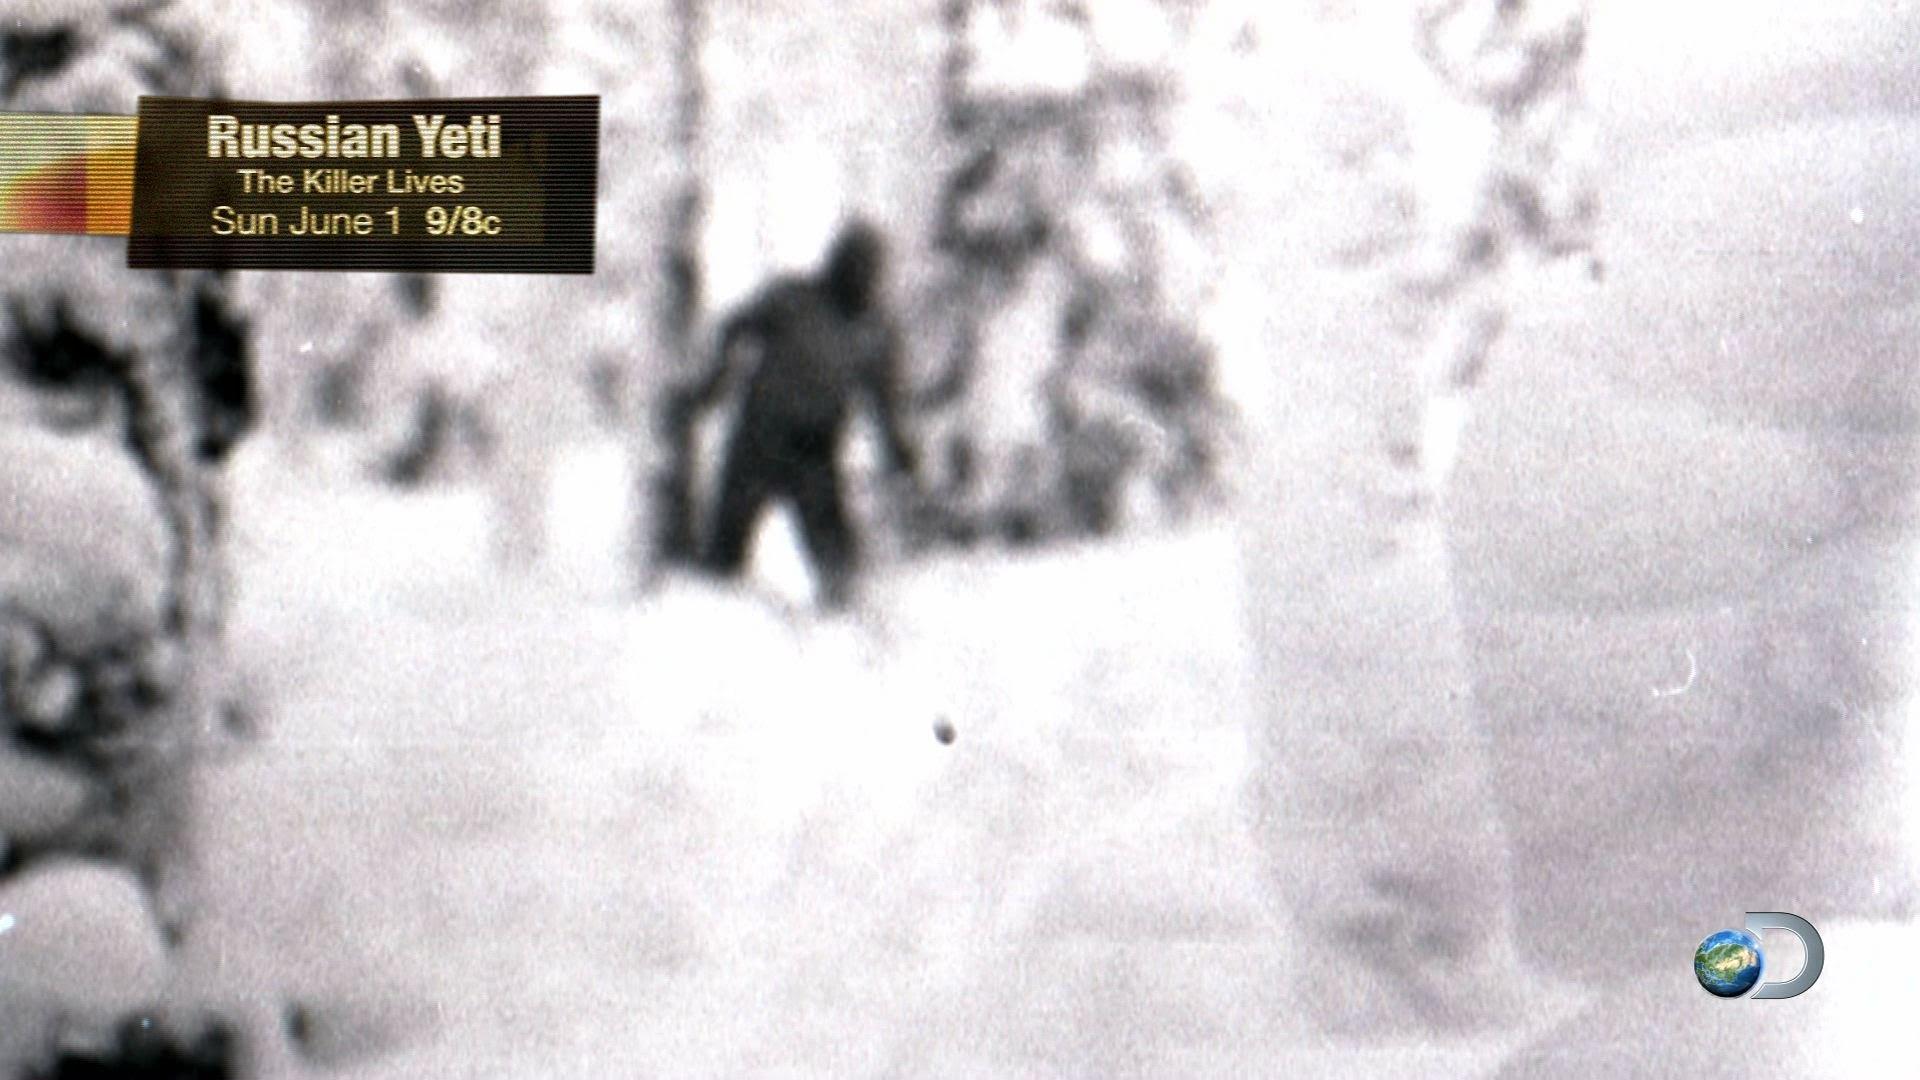 Discovery-Перевал Дятлова гипотеза о йети